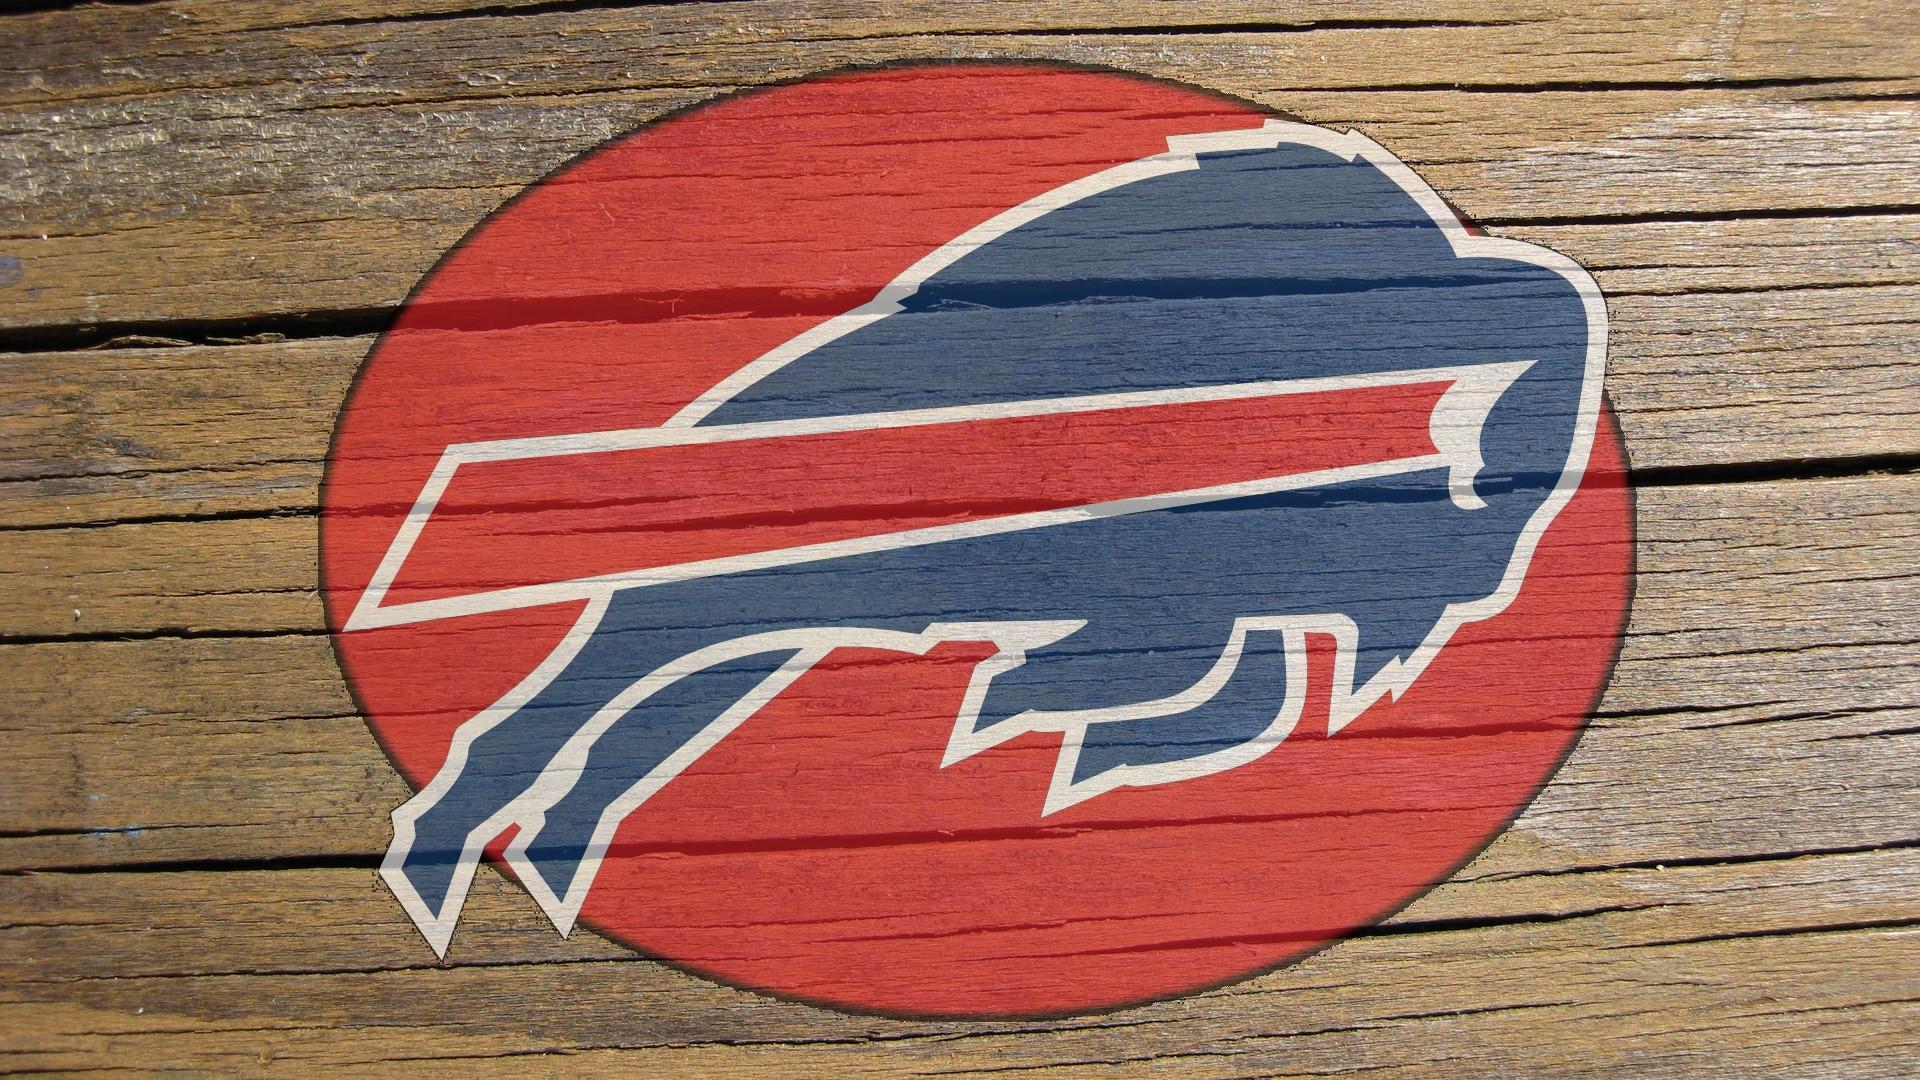 Buffalo Bills Nfl 1920x1080 Hd Images 1920x1080